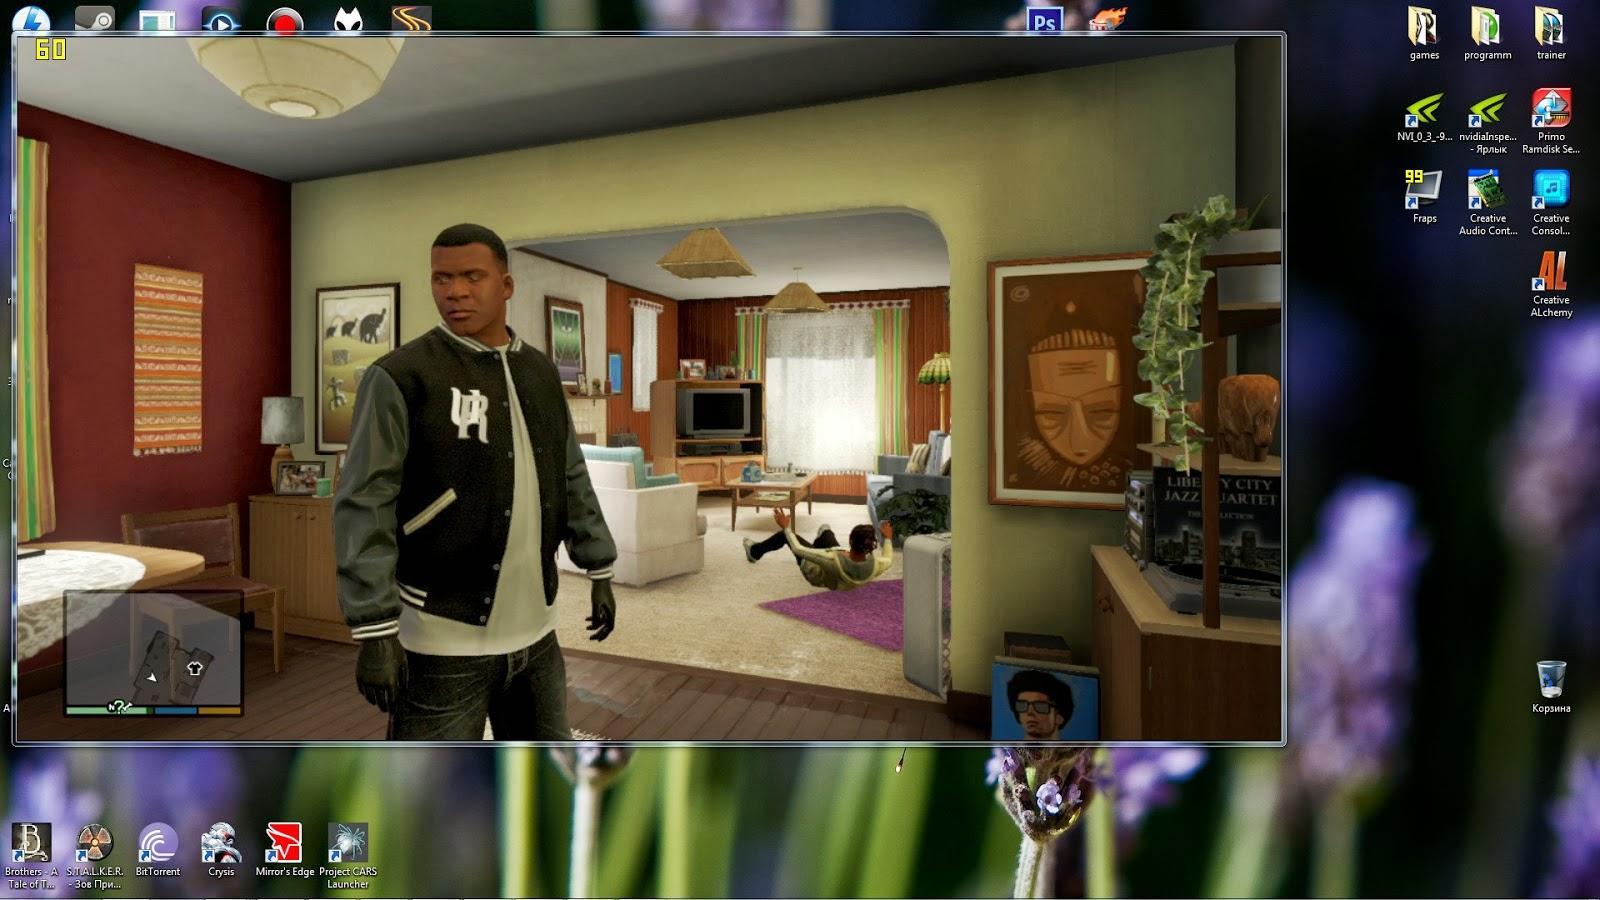 grand theft auto 5 ps3 emulator download